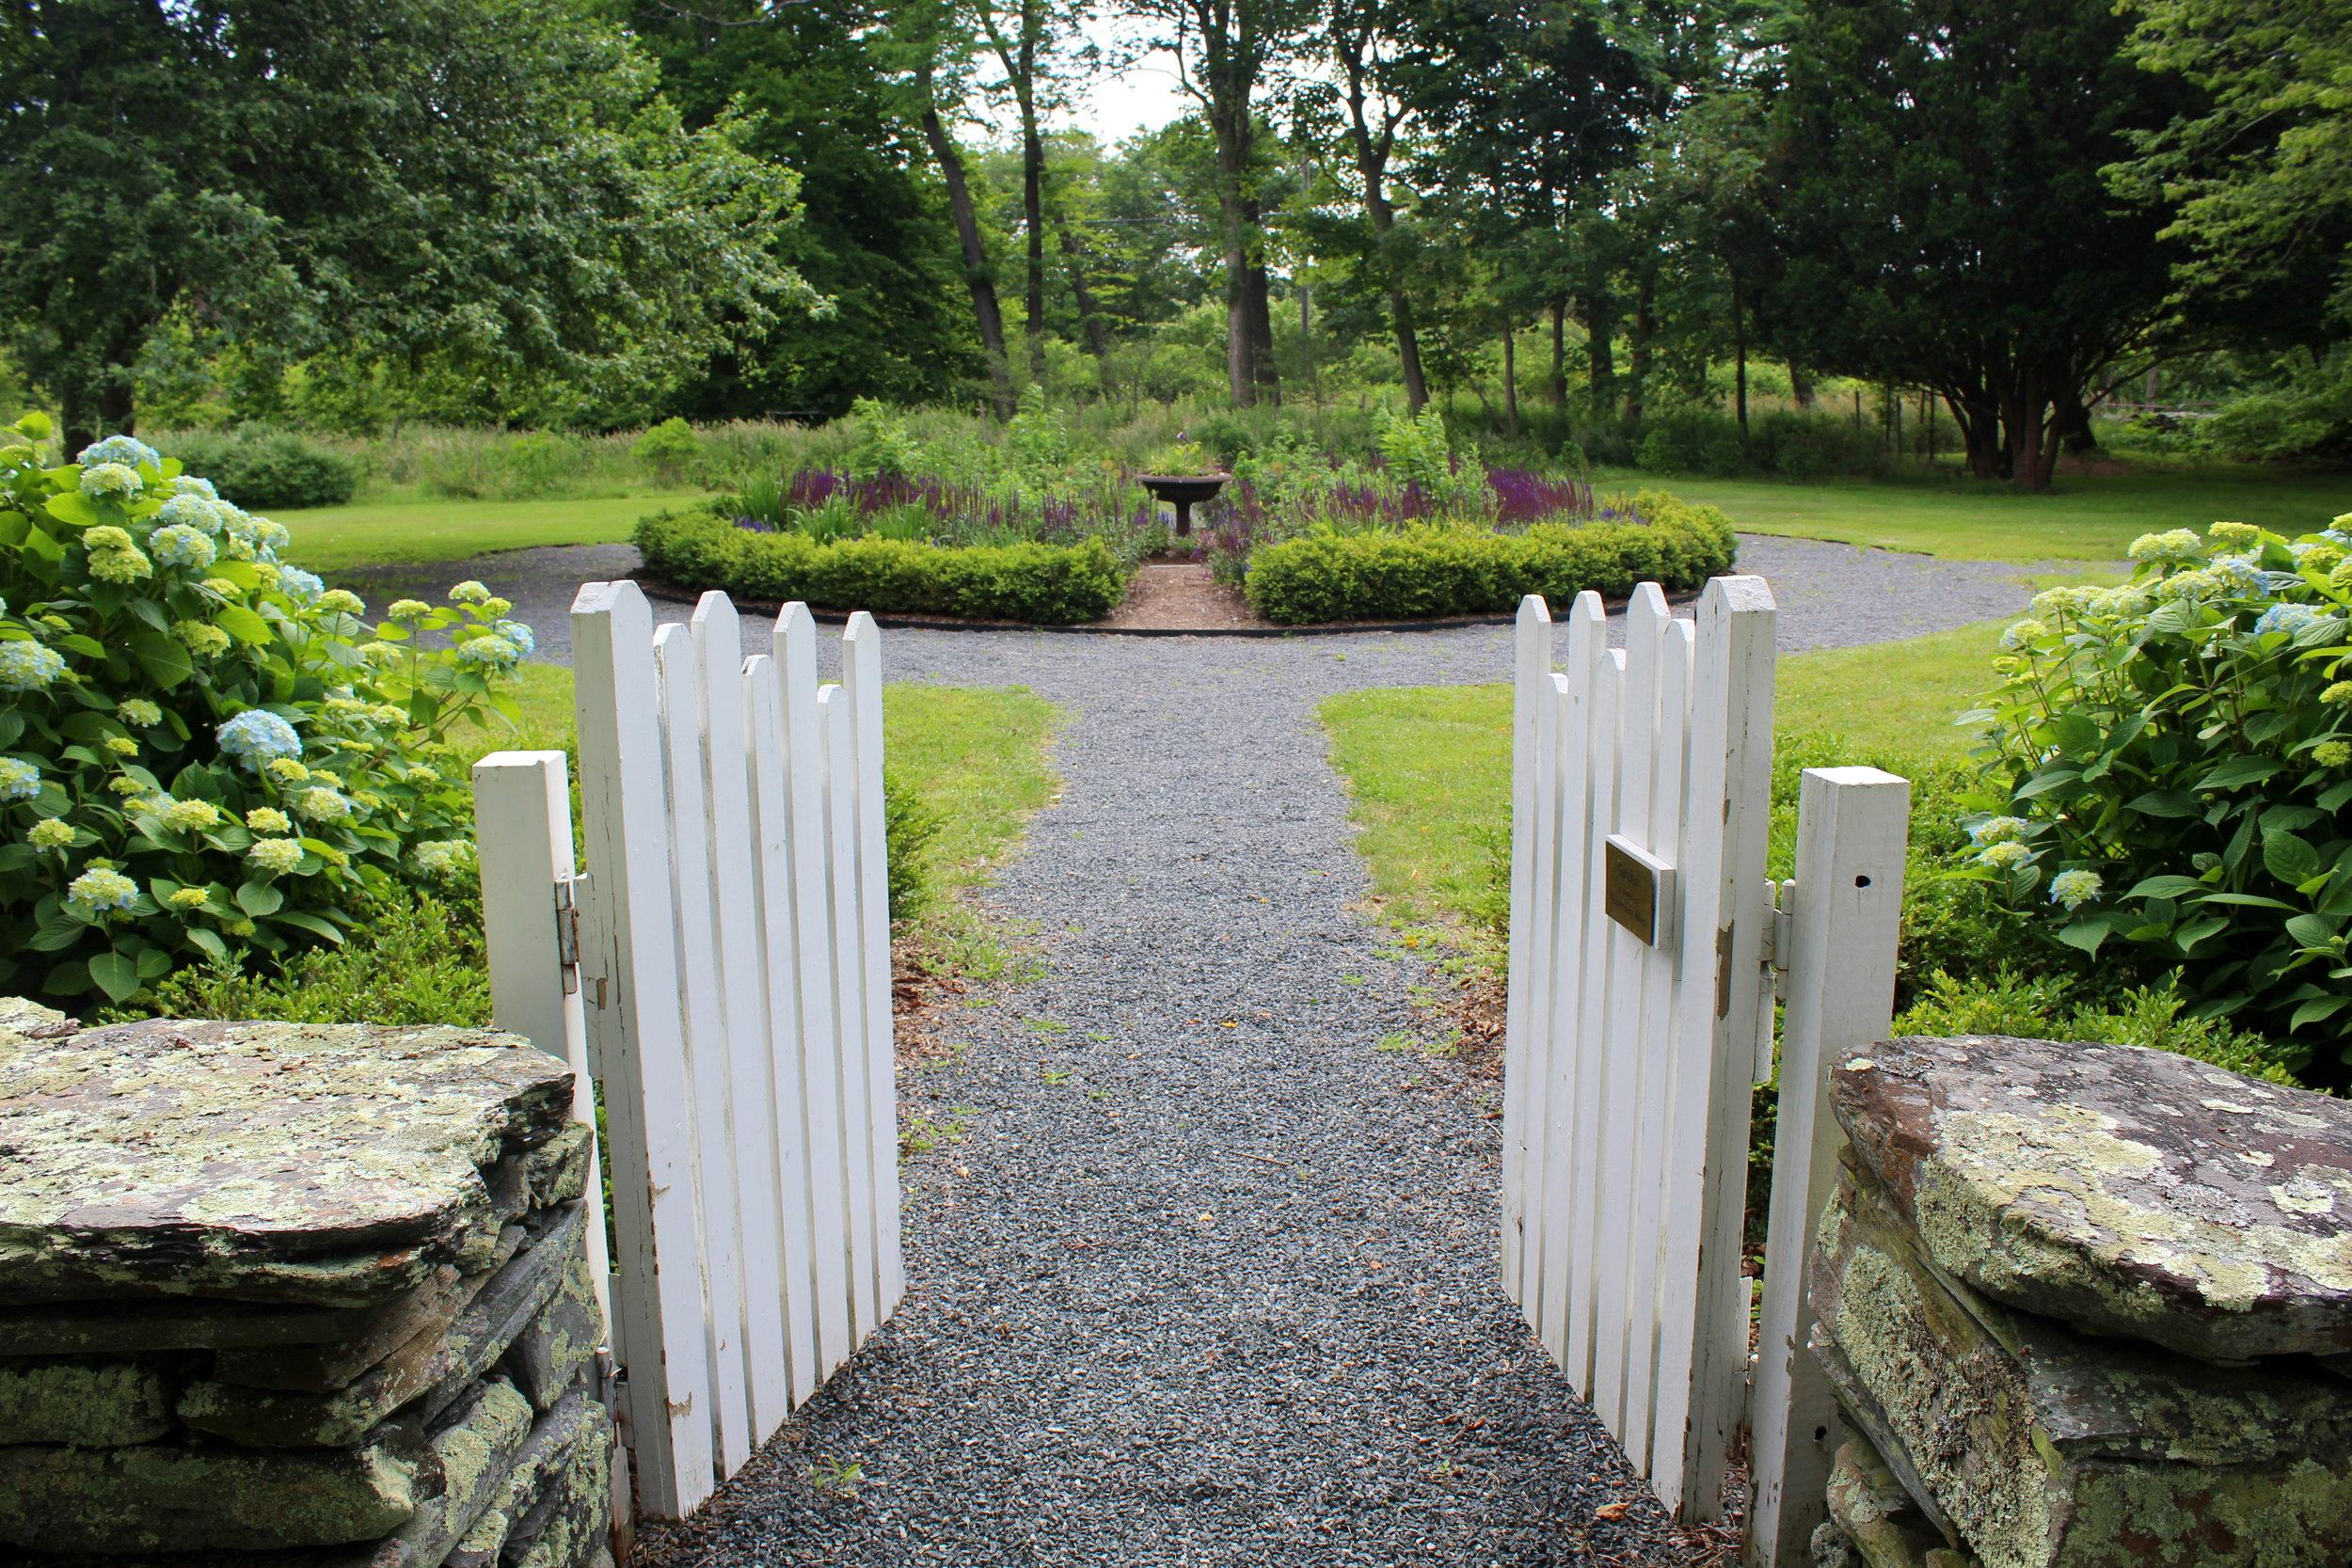 West entrance gate